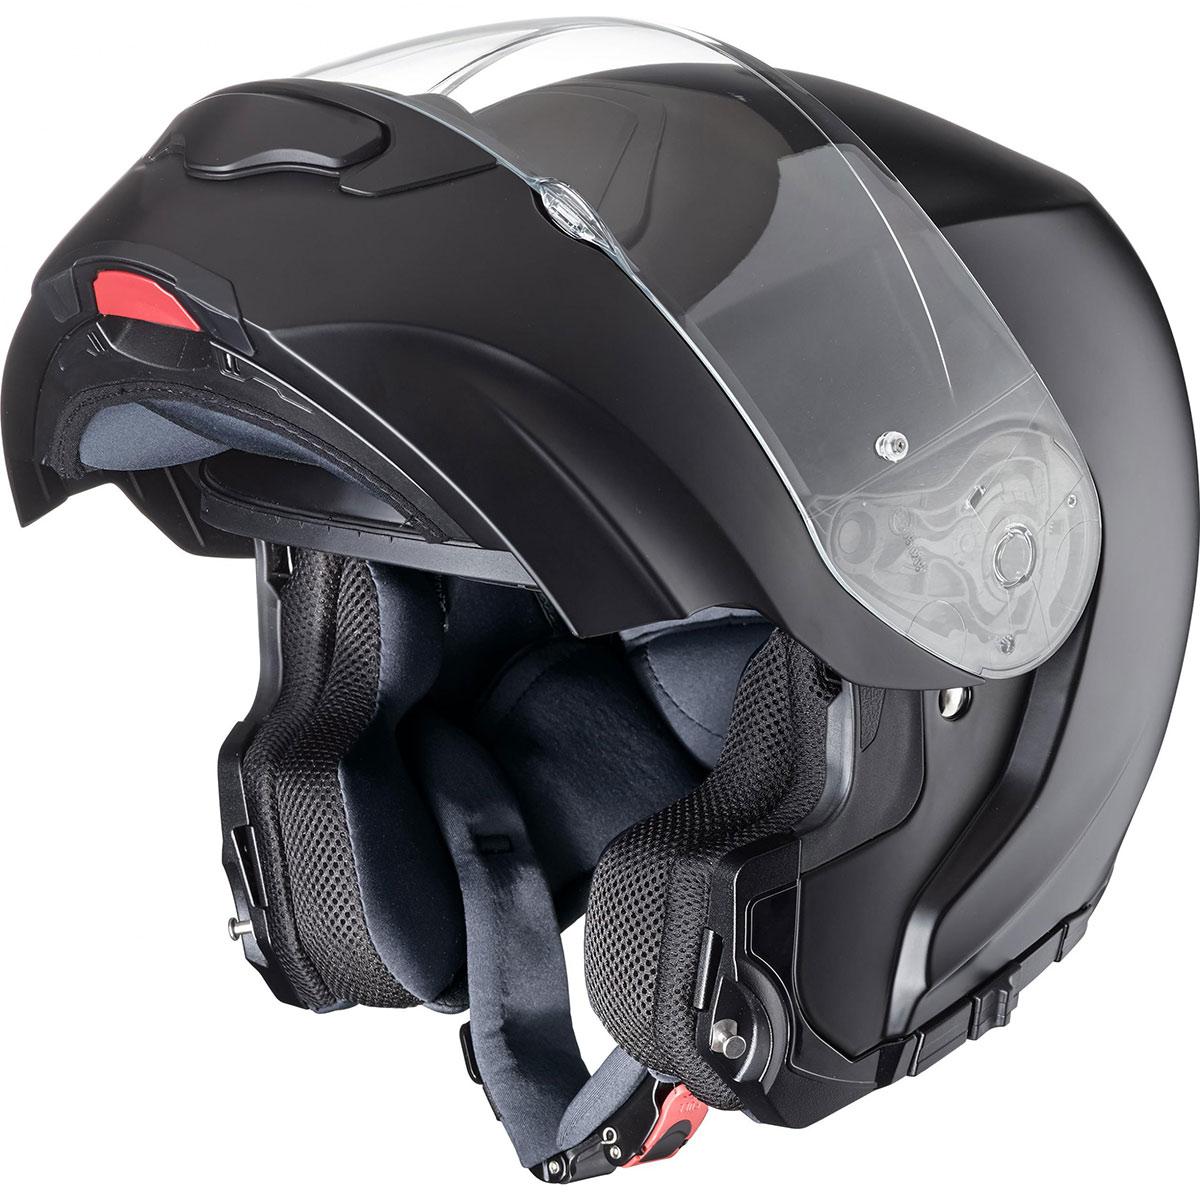 recenze helmy scorpion exo 3000 motohodnocen cz. Black Bedroom Furniture Sets. Home Design Ideas